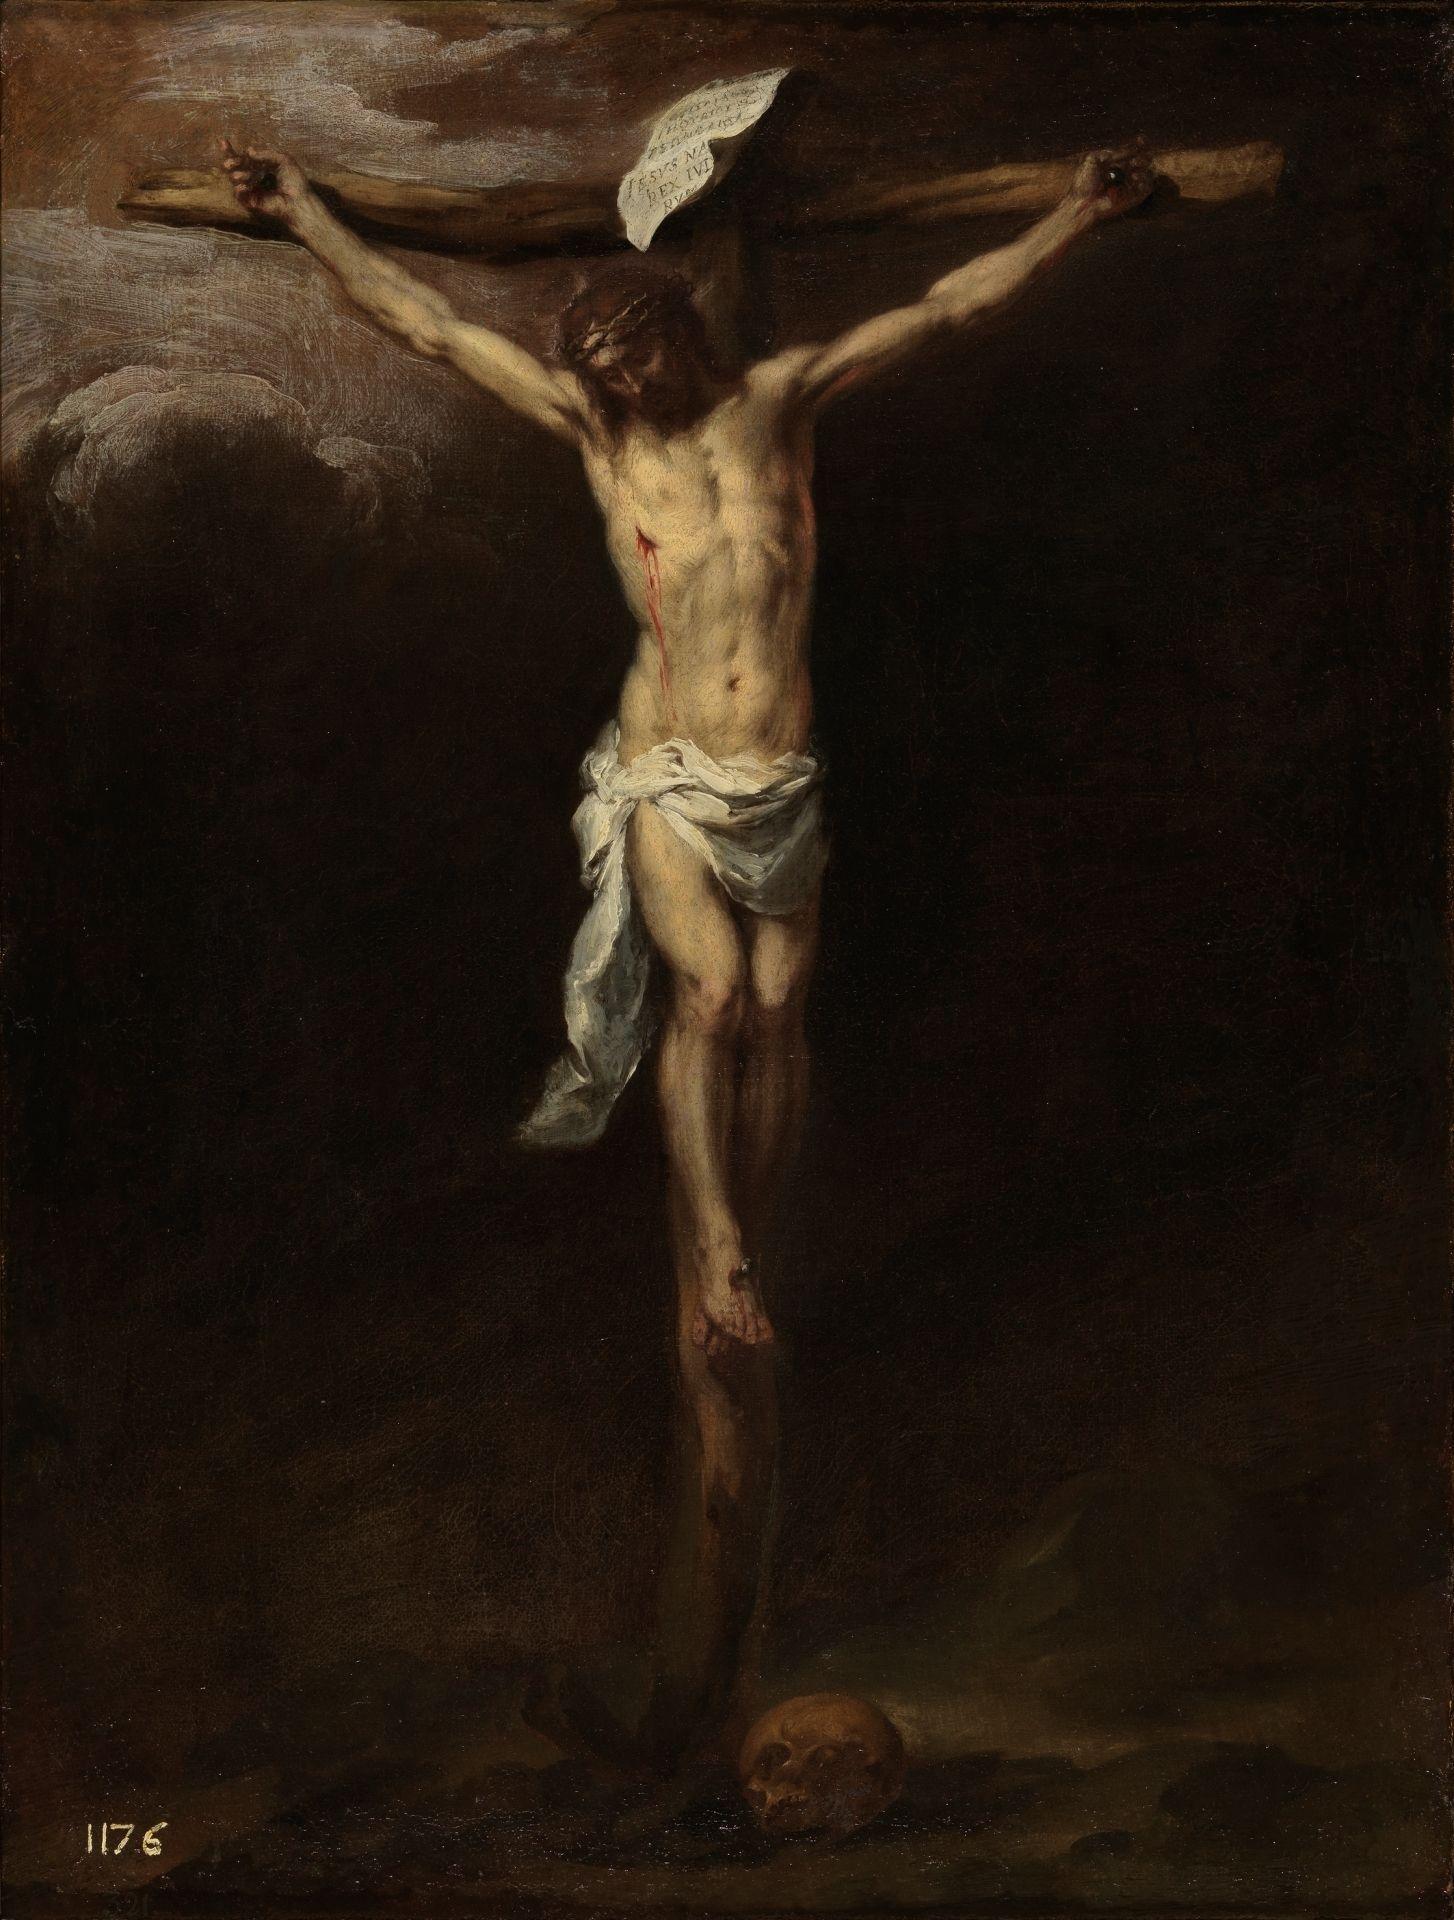 Christ and Him Crucified by Cornelis Venema - ligonier.org